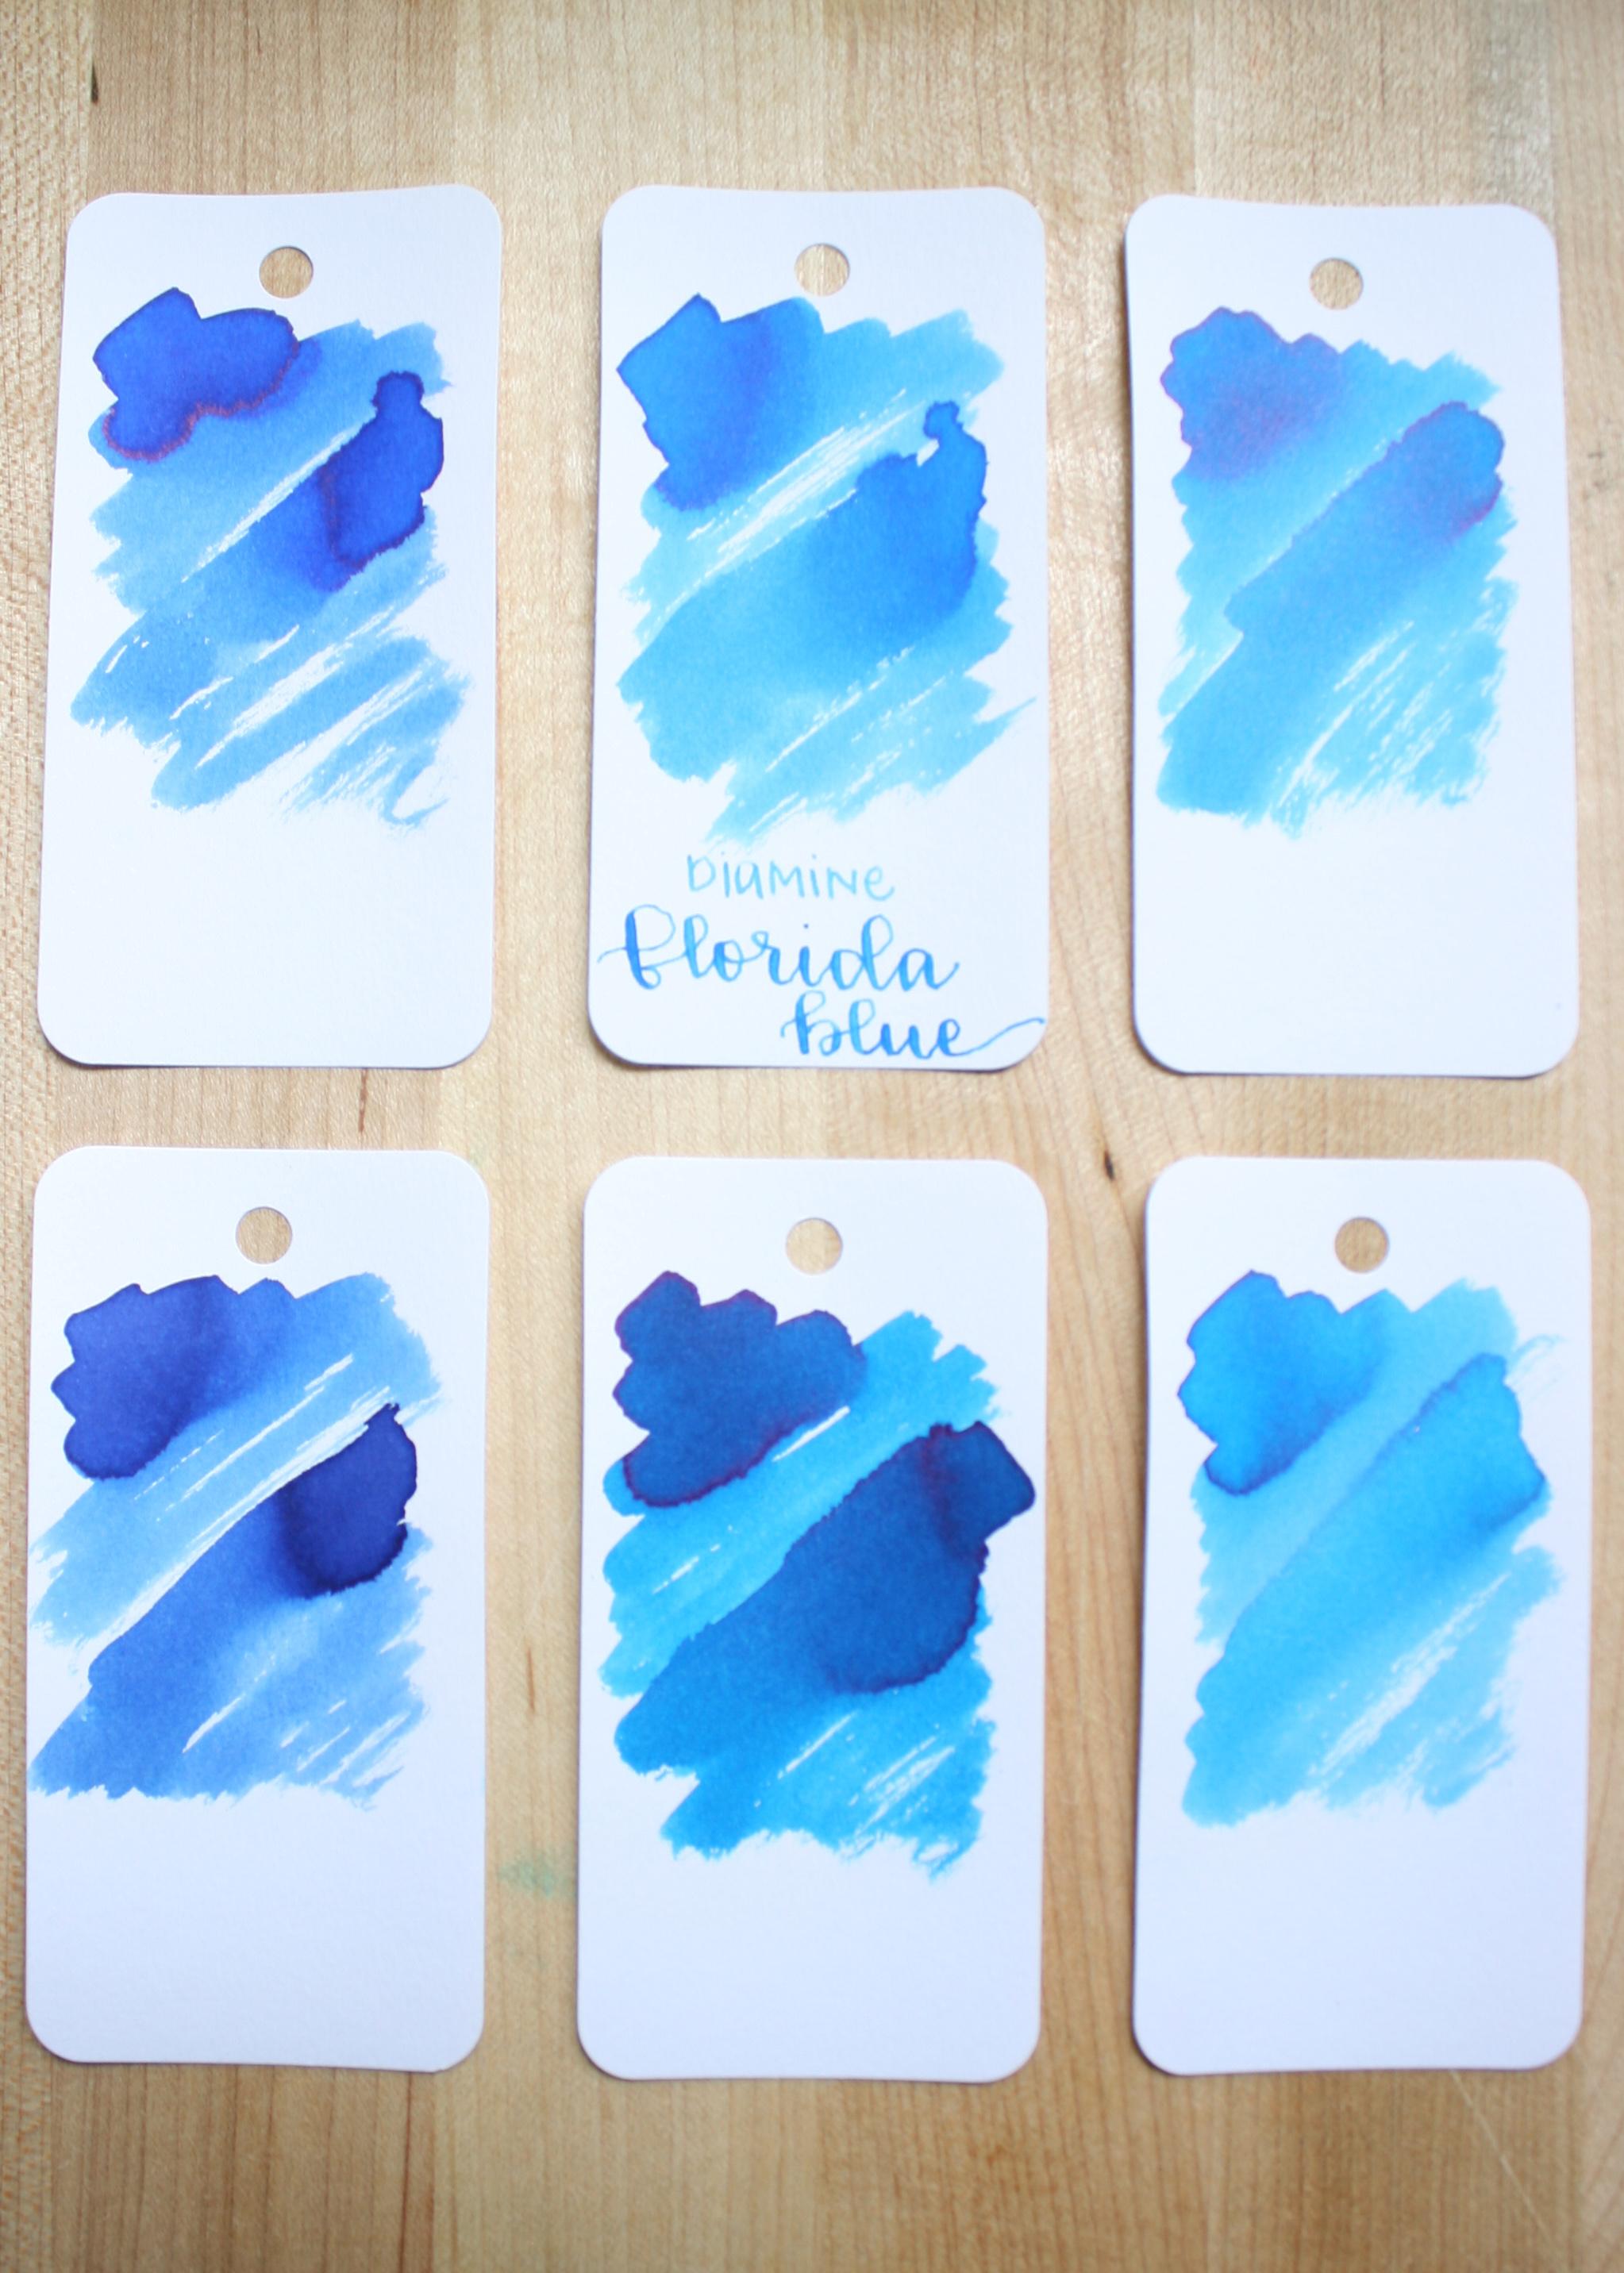 Similar inks: - Top row: left to right, Diamine Royal Blue, Diamine Florida Blue, and Pilot Iroshizuku Kon-peki. Bottom row: Diamine Kensington Blue, Diamine Asa Blue, and Pilot Iroshizuku Ama-iro.